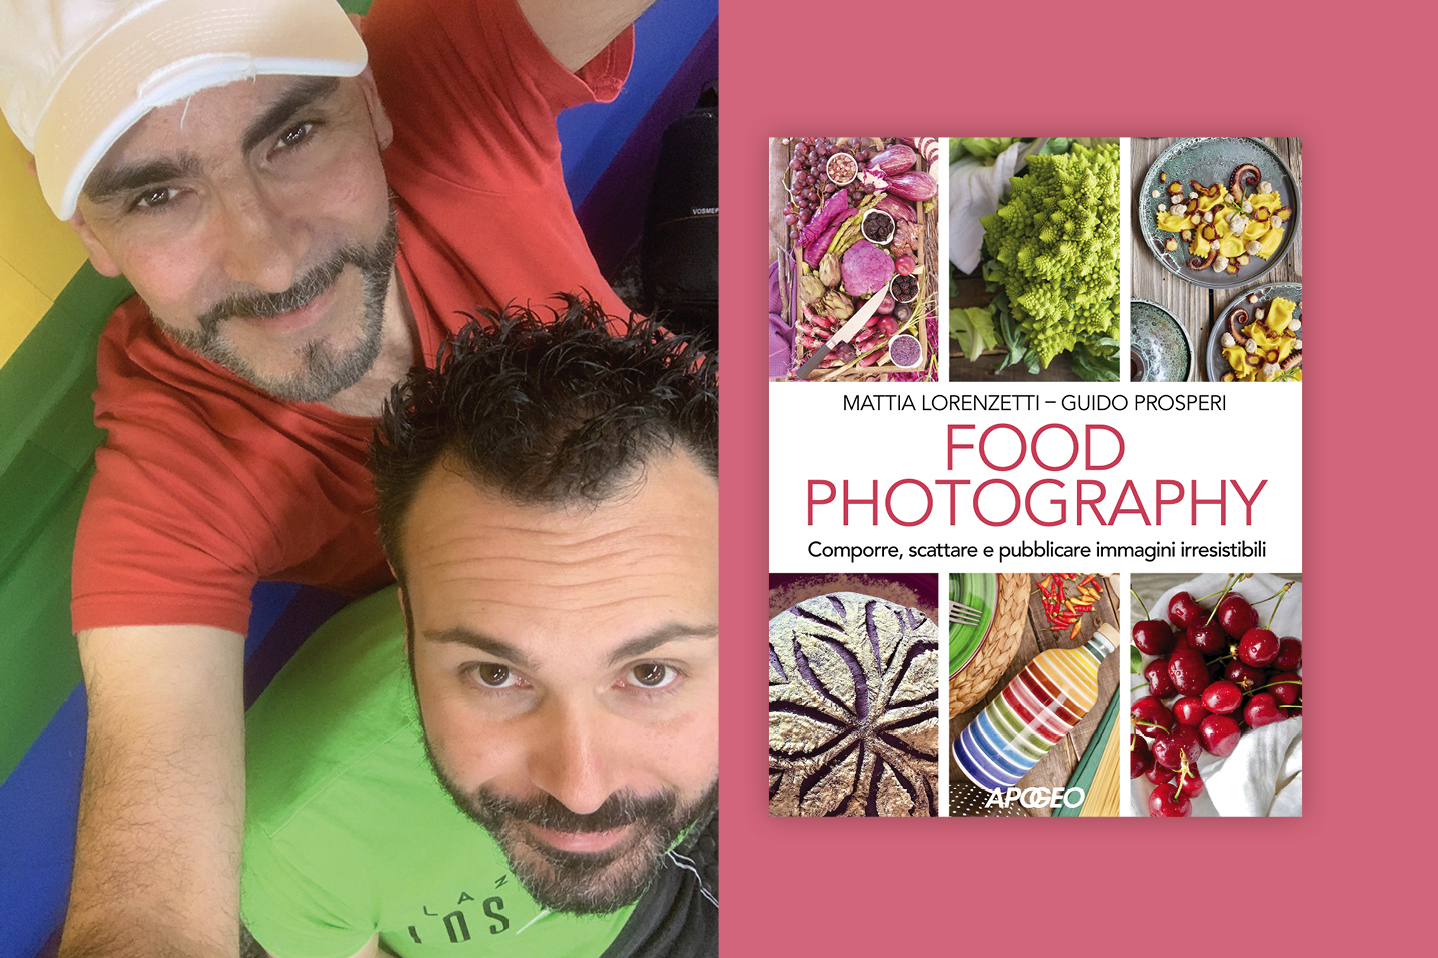 FoodPhotography-MattiaLorenzetti-GuidoProsperi